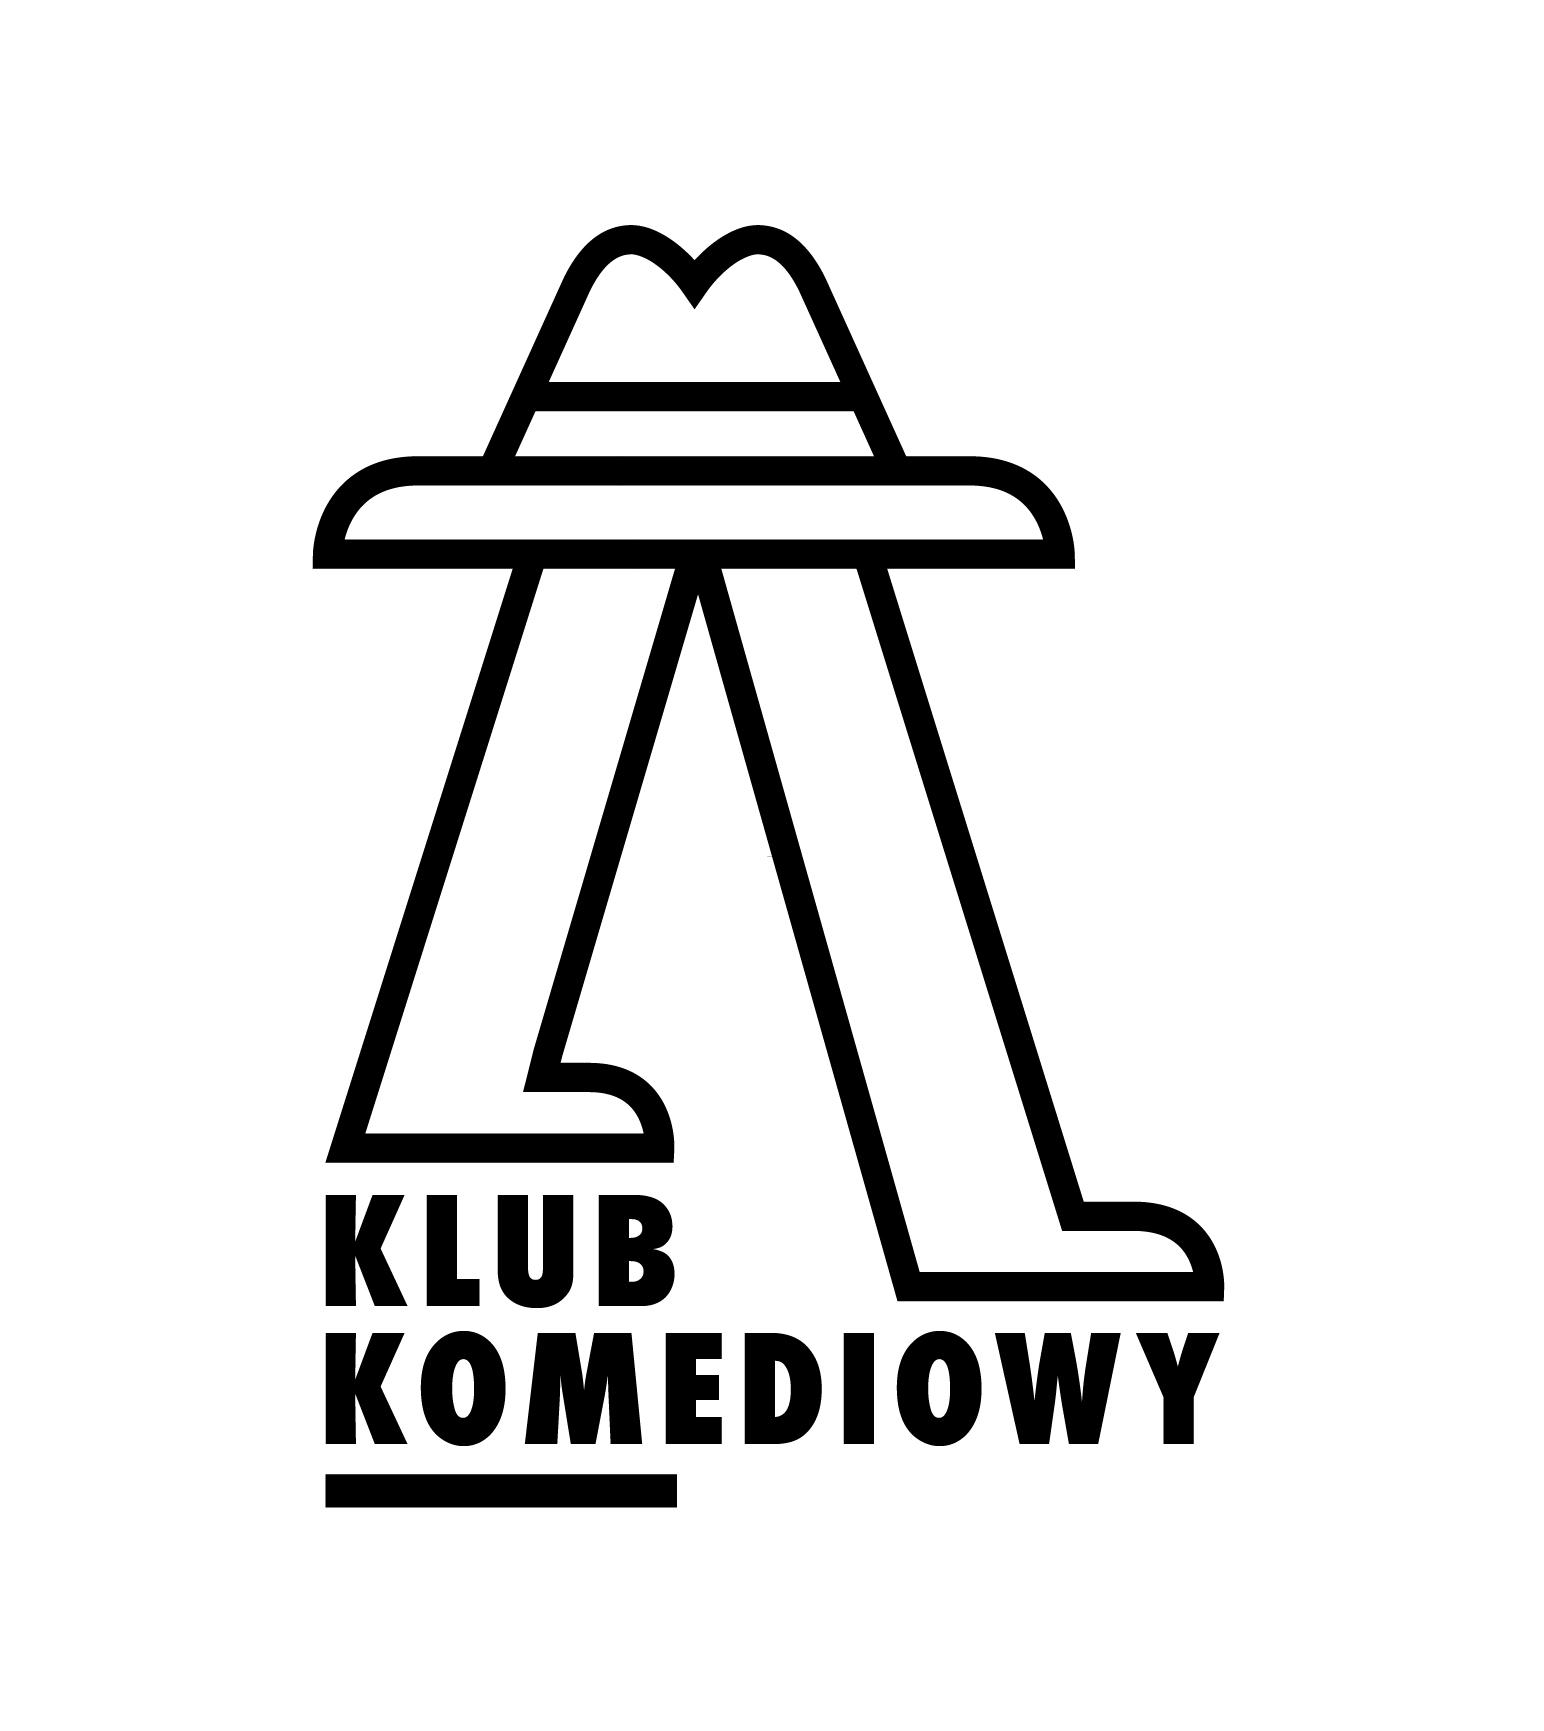 Klub Komediowy